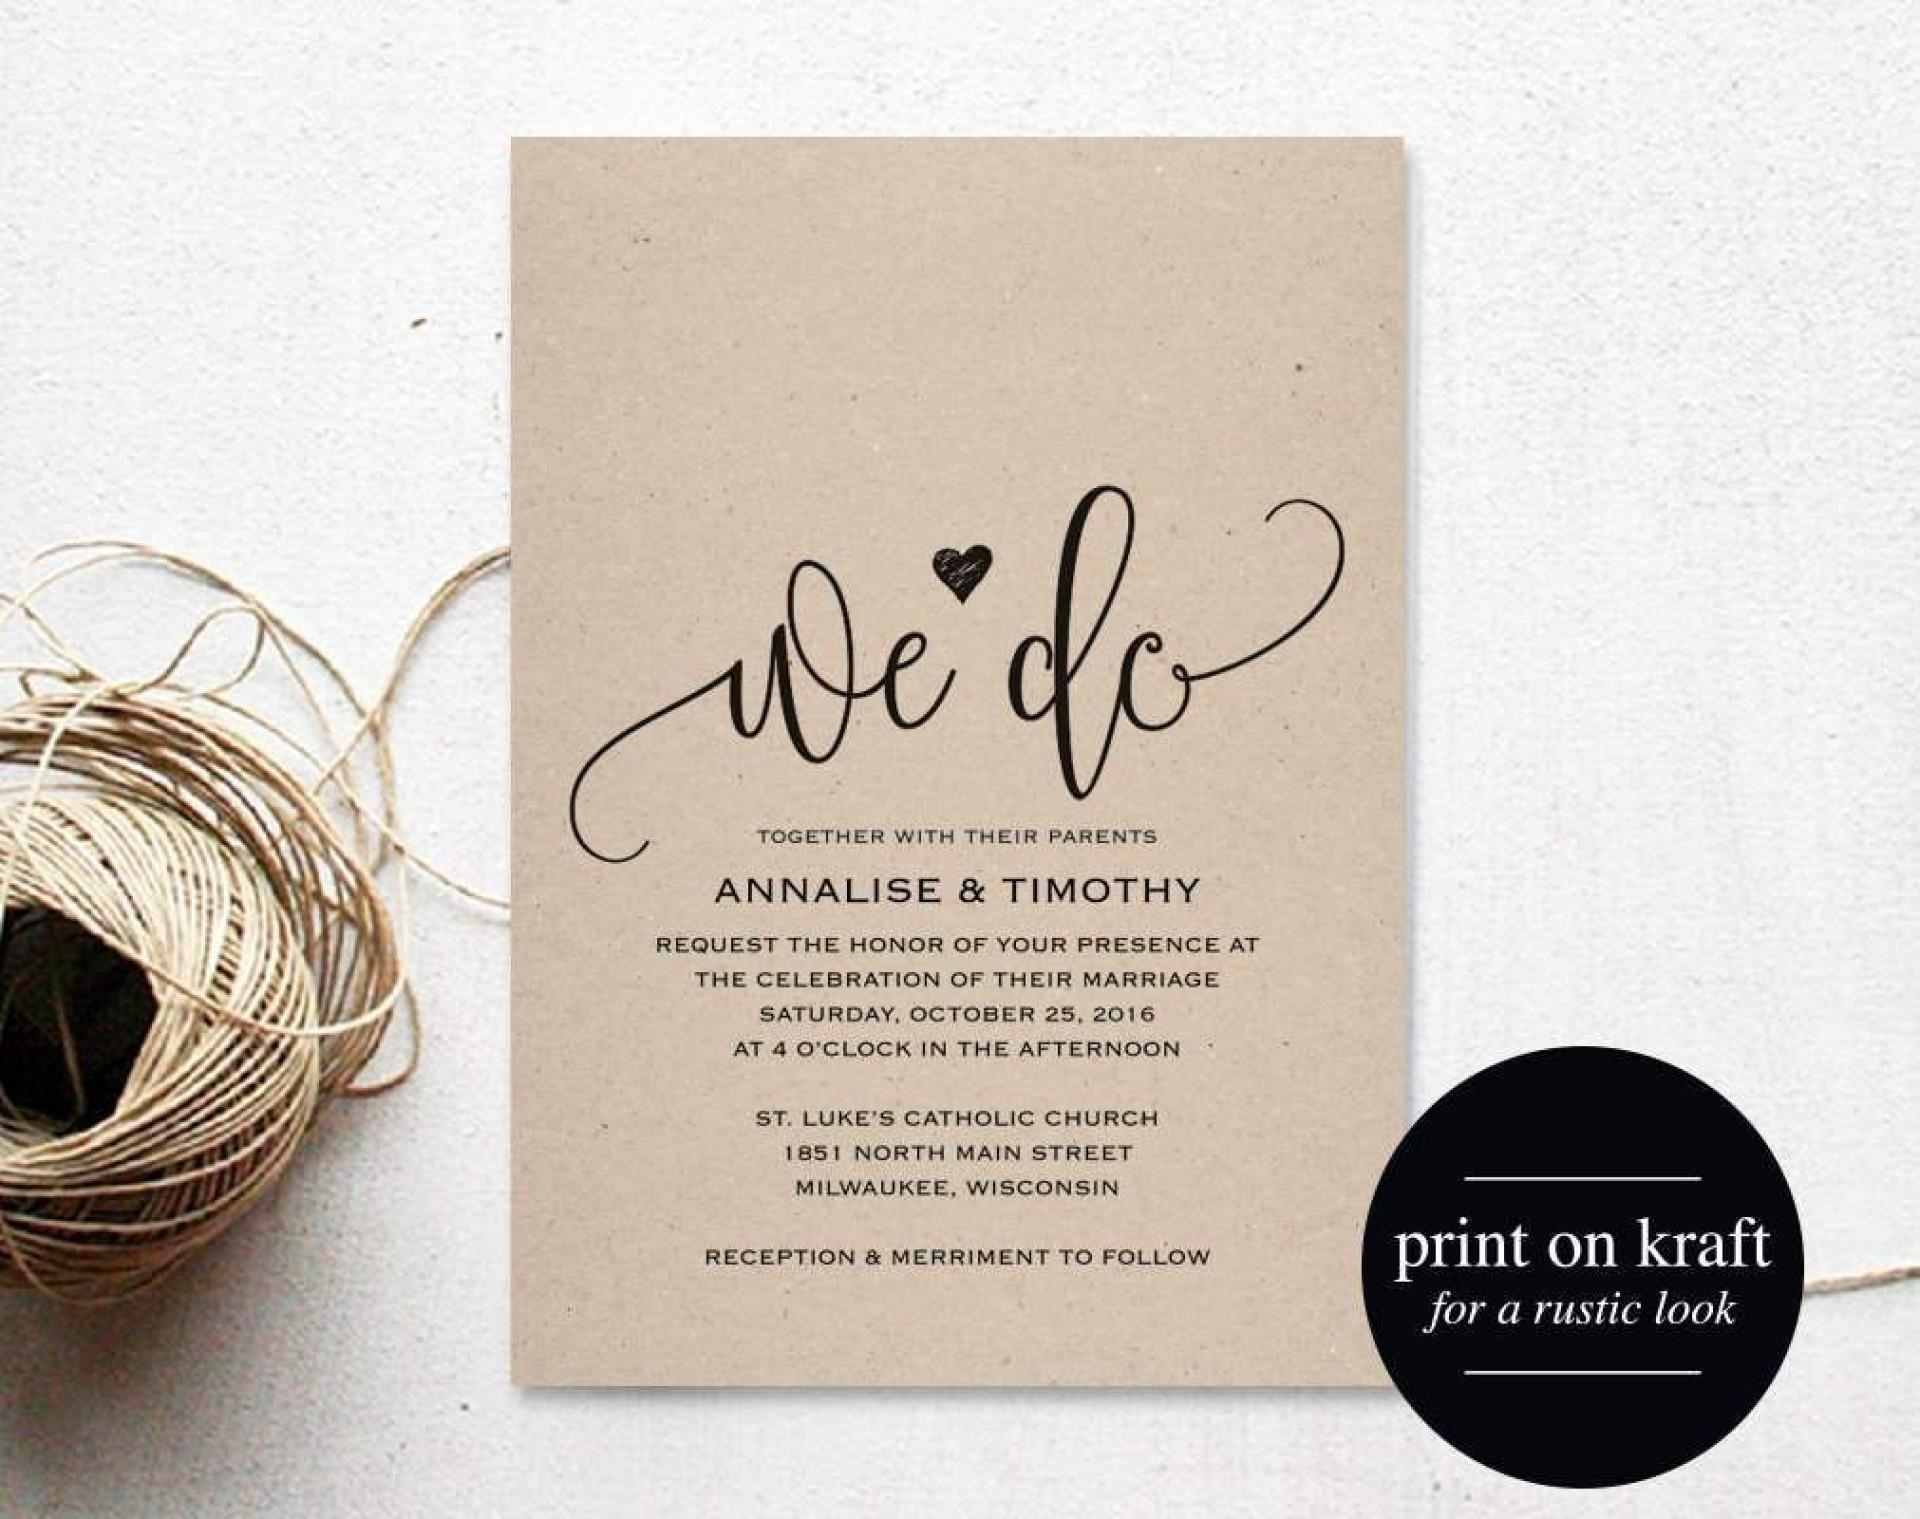 002 Fascinating Microsoft Word Wedding Invitation Template Free Download Concept  M Editable1920